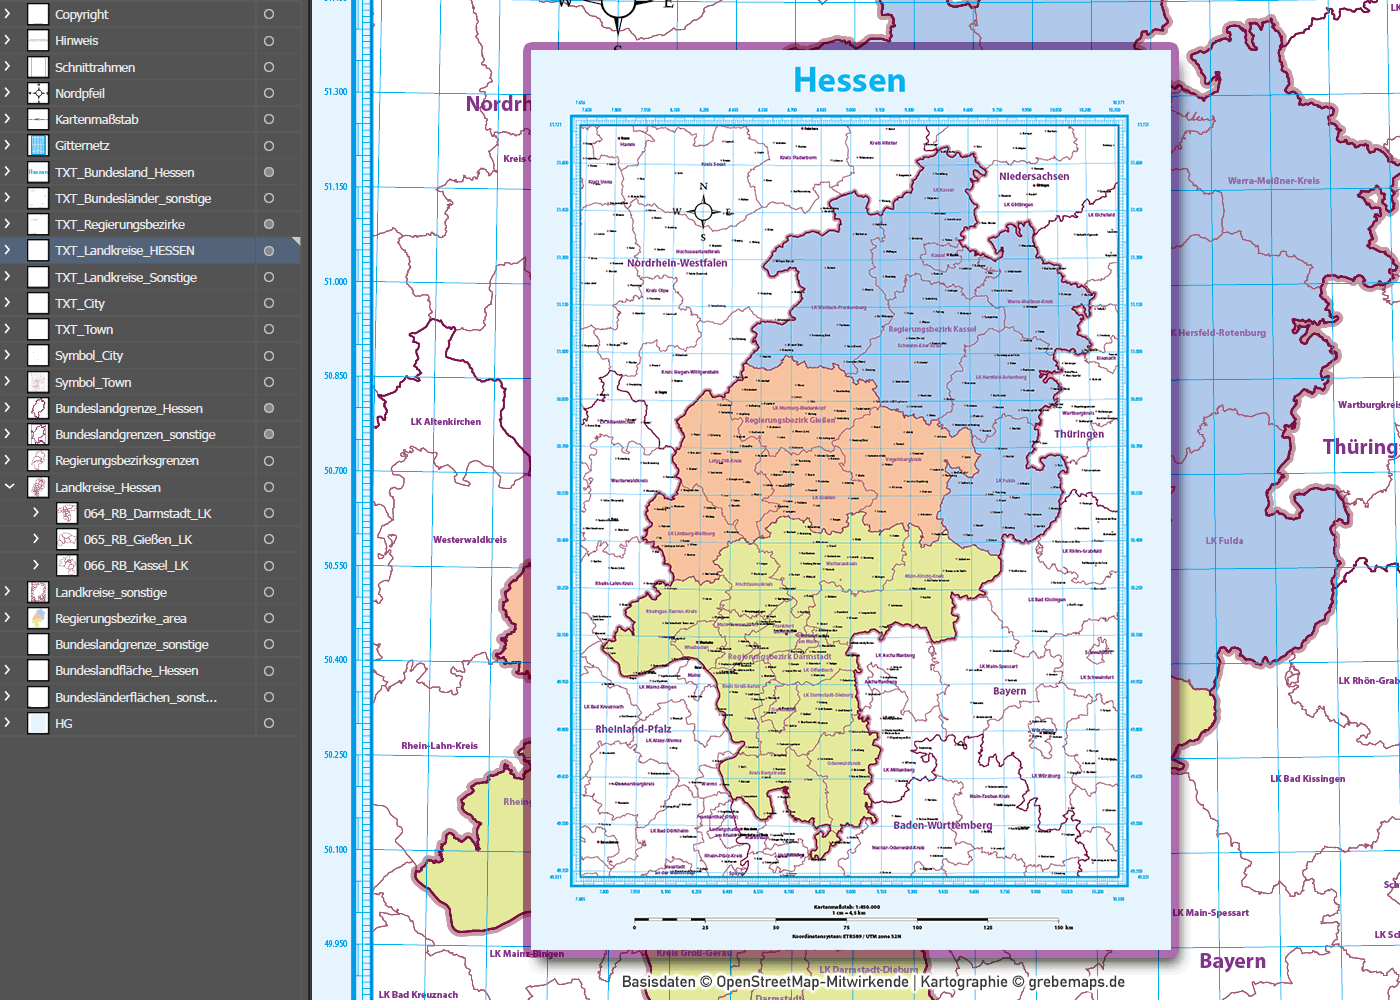 Hessen Vektorkarte Regierungsbezirke Landkreise, Karte Hessen Landkreise, Karte Hessen Regierungsbezirke, Vektorkarte Hessen Landkreise, Landkarte Hessen Landkreise, Vektorgrafik Hessen Landkreise, AI, download, editierbar